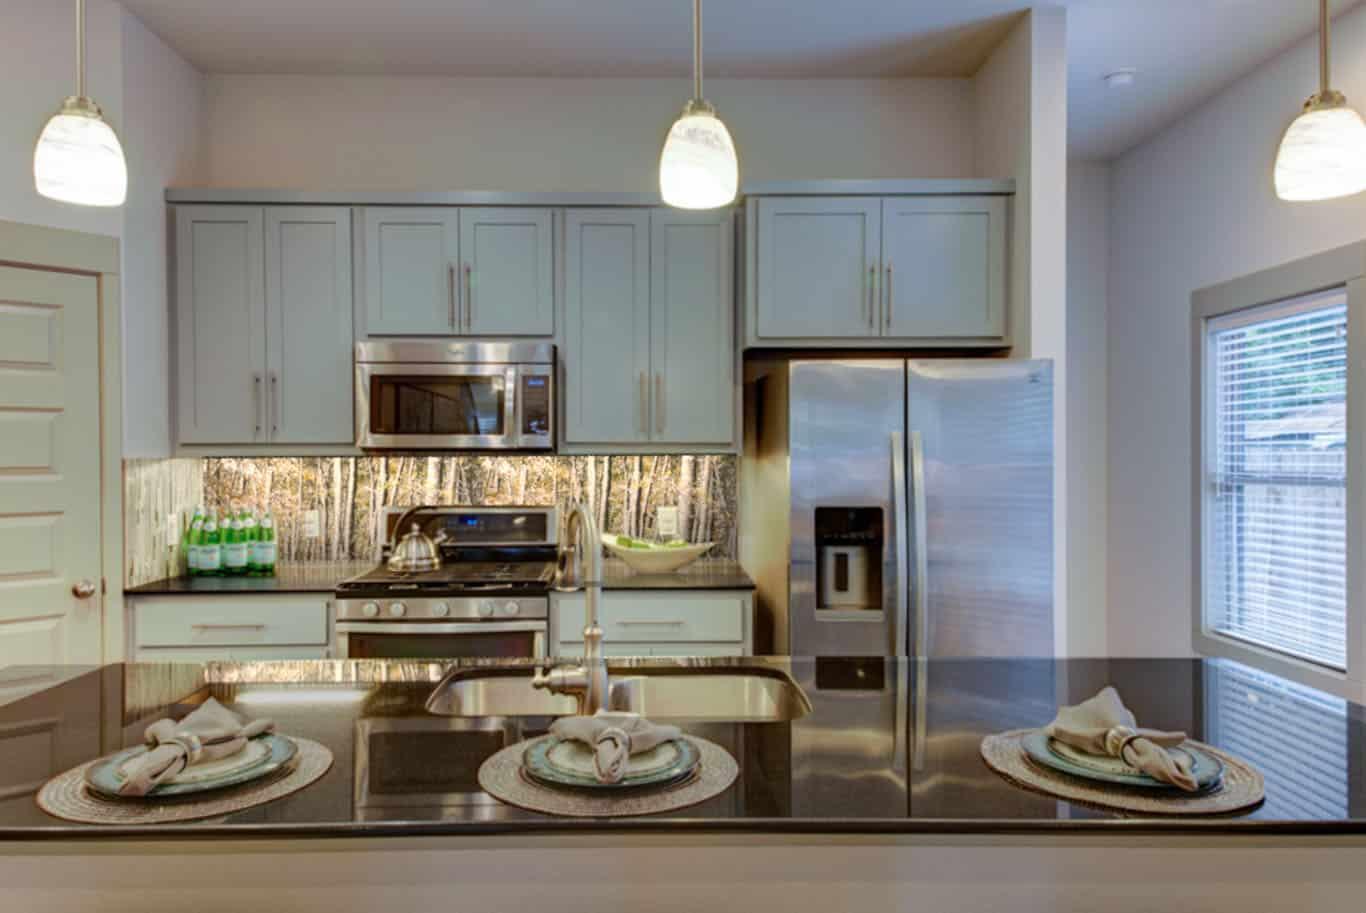 Digital Glass Kitchen Backsplash with a glass photography panel